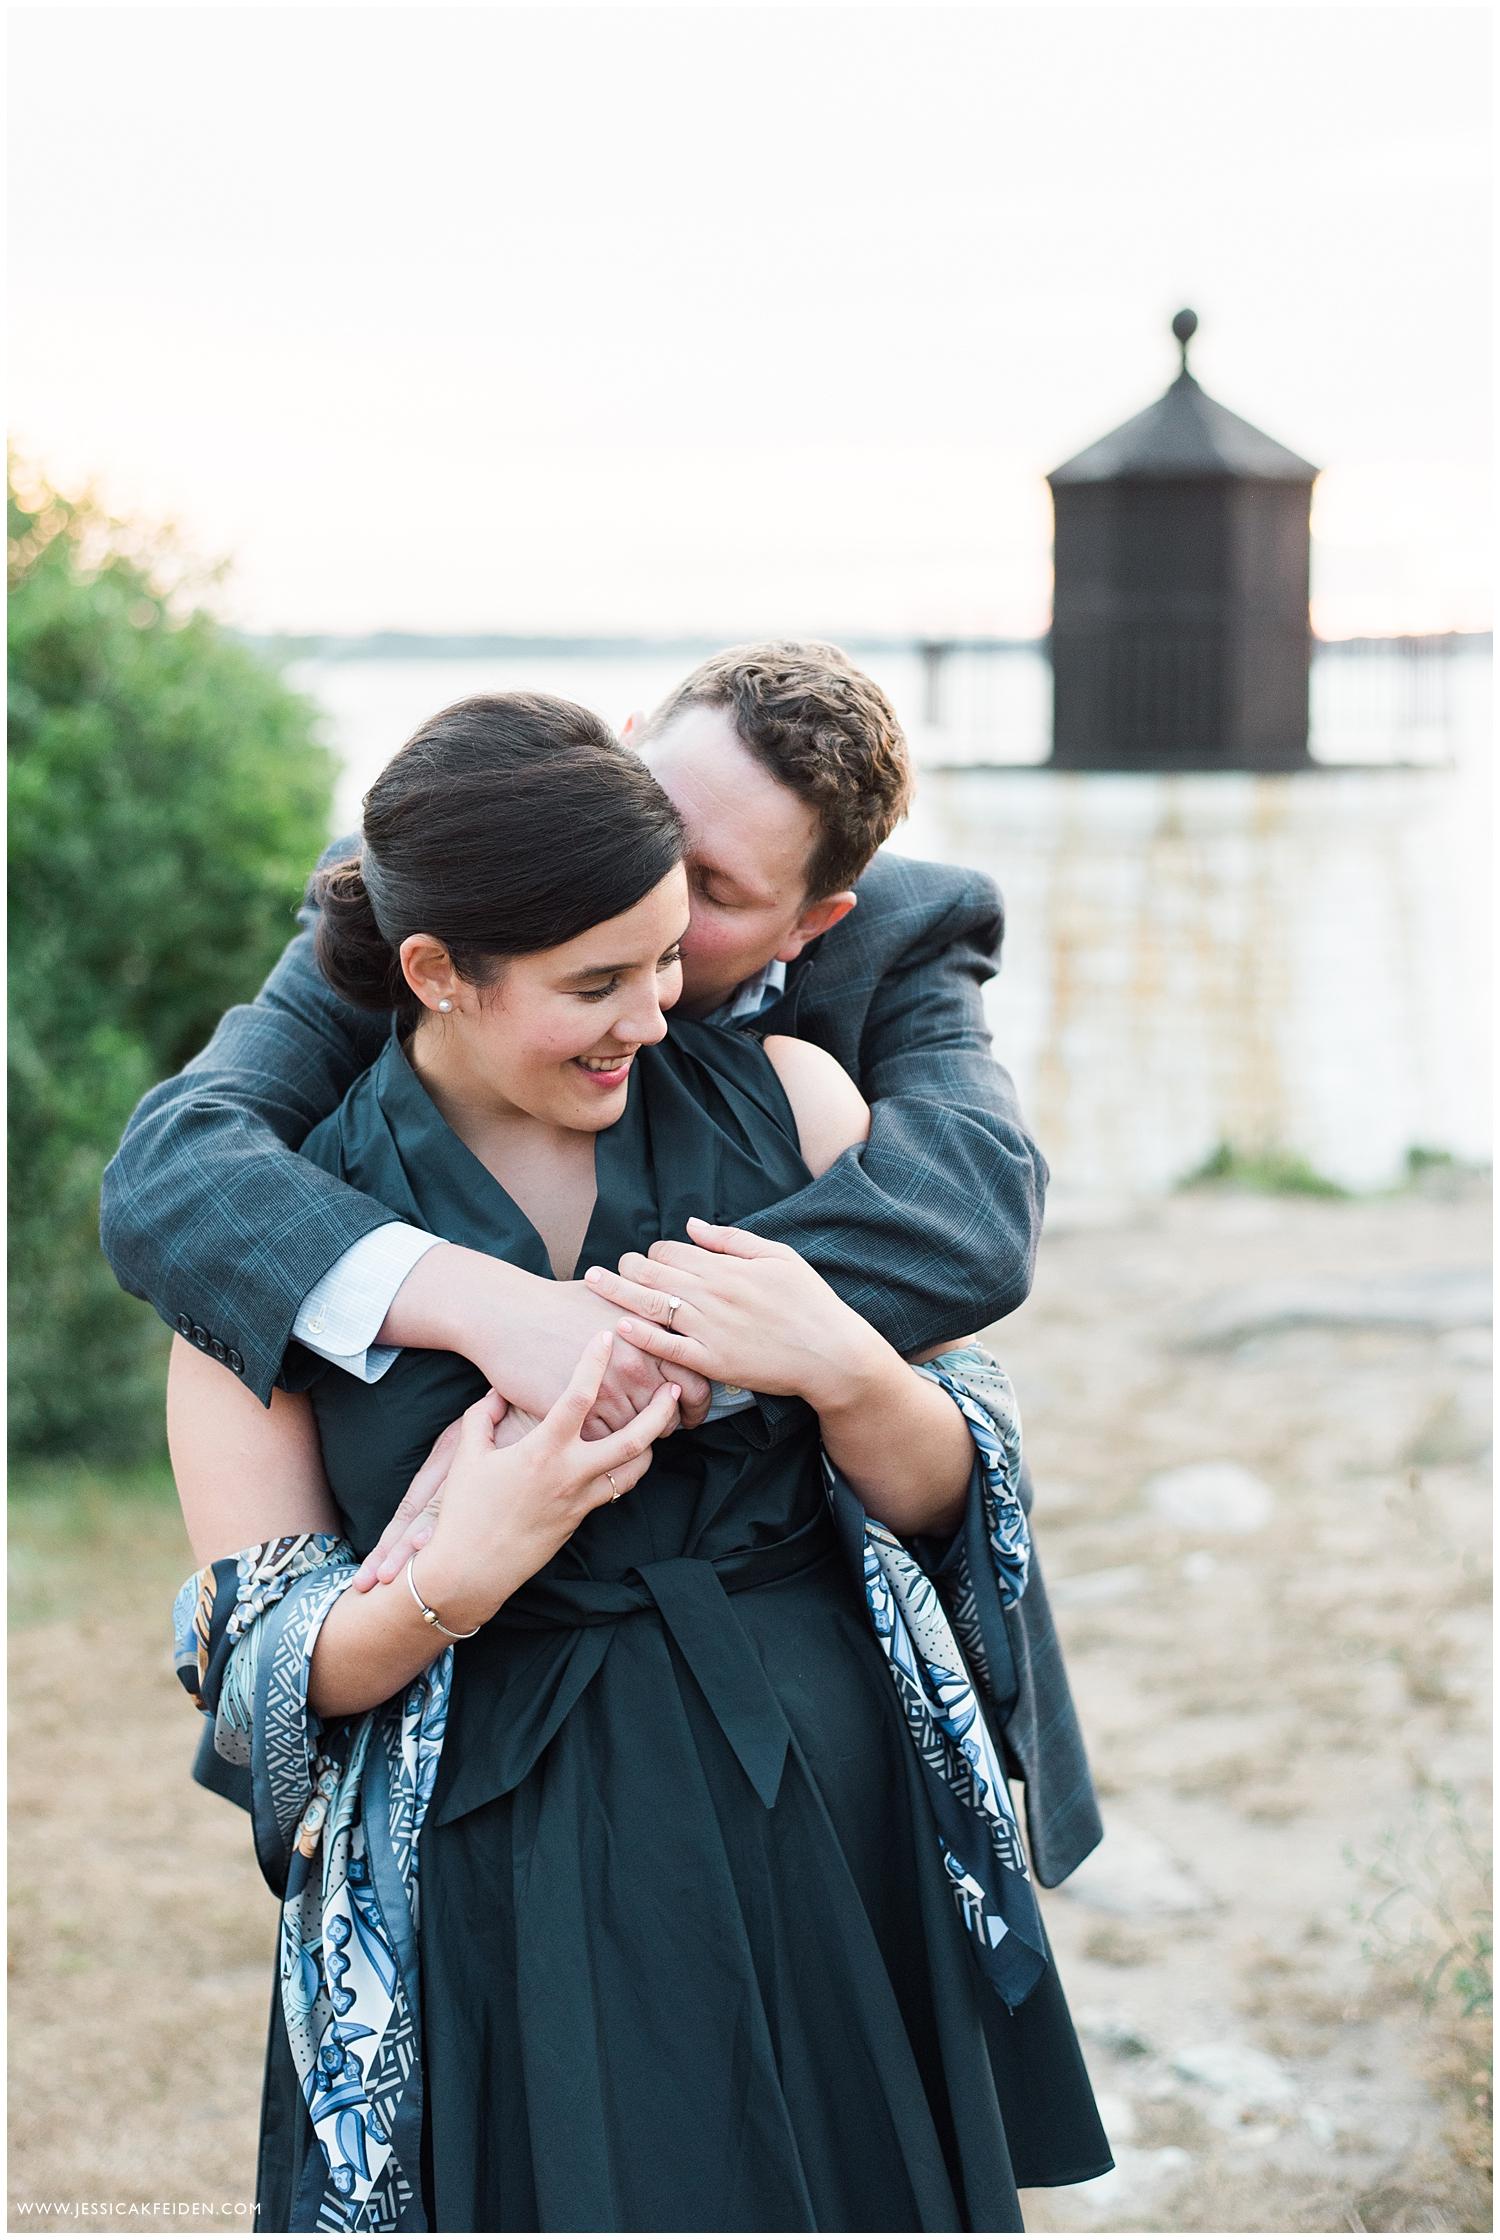 Jessica K Feiden Photography_Castle Hill Lighthouse Newport Engagement Session Photographer_0009.jpg